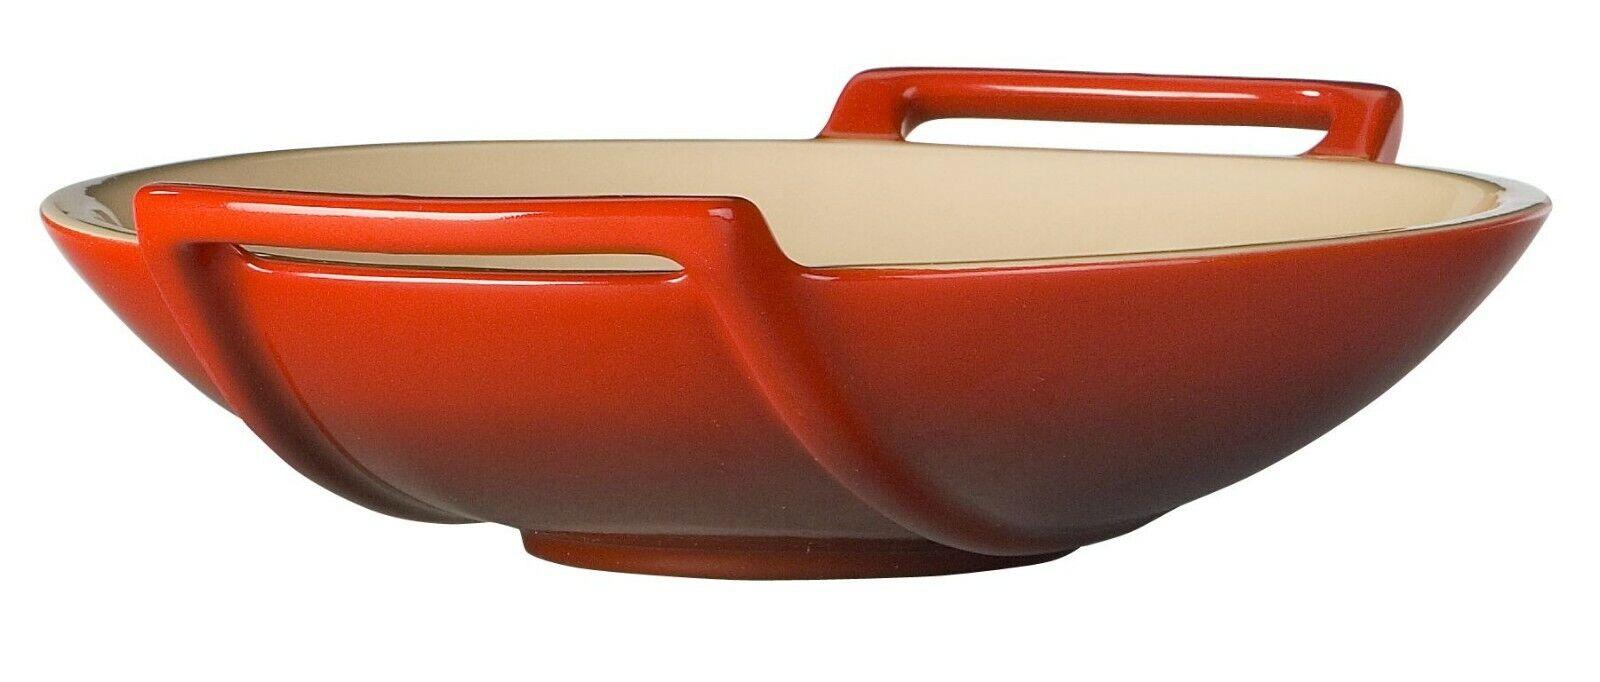 beautiful durable 2 wok bowls dishes 8